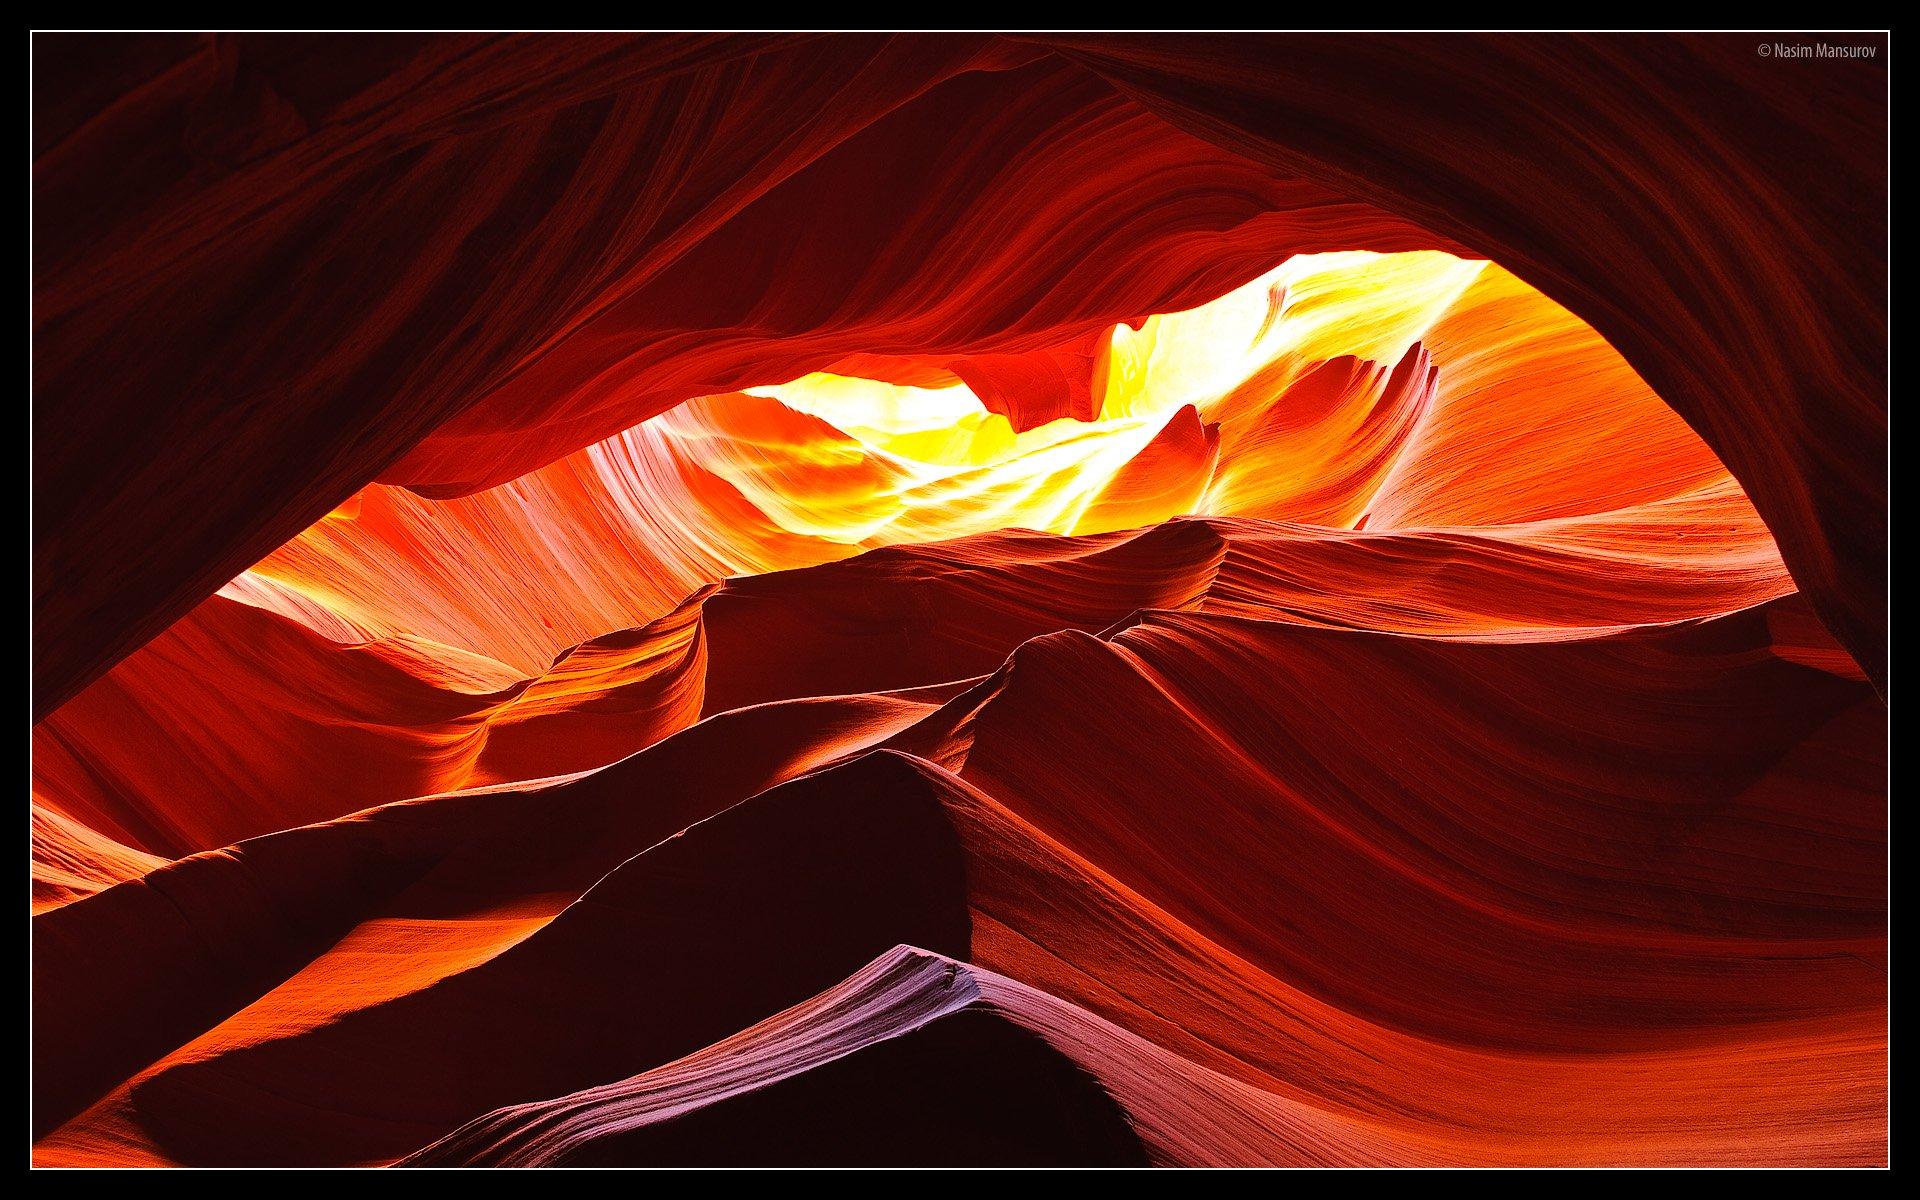 Fall Wallpaper Hd 1920x1080 Antelope Canyon Wallpaper 1920x1200 70260